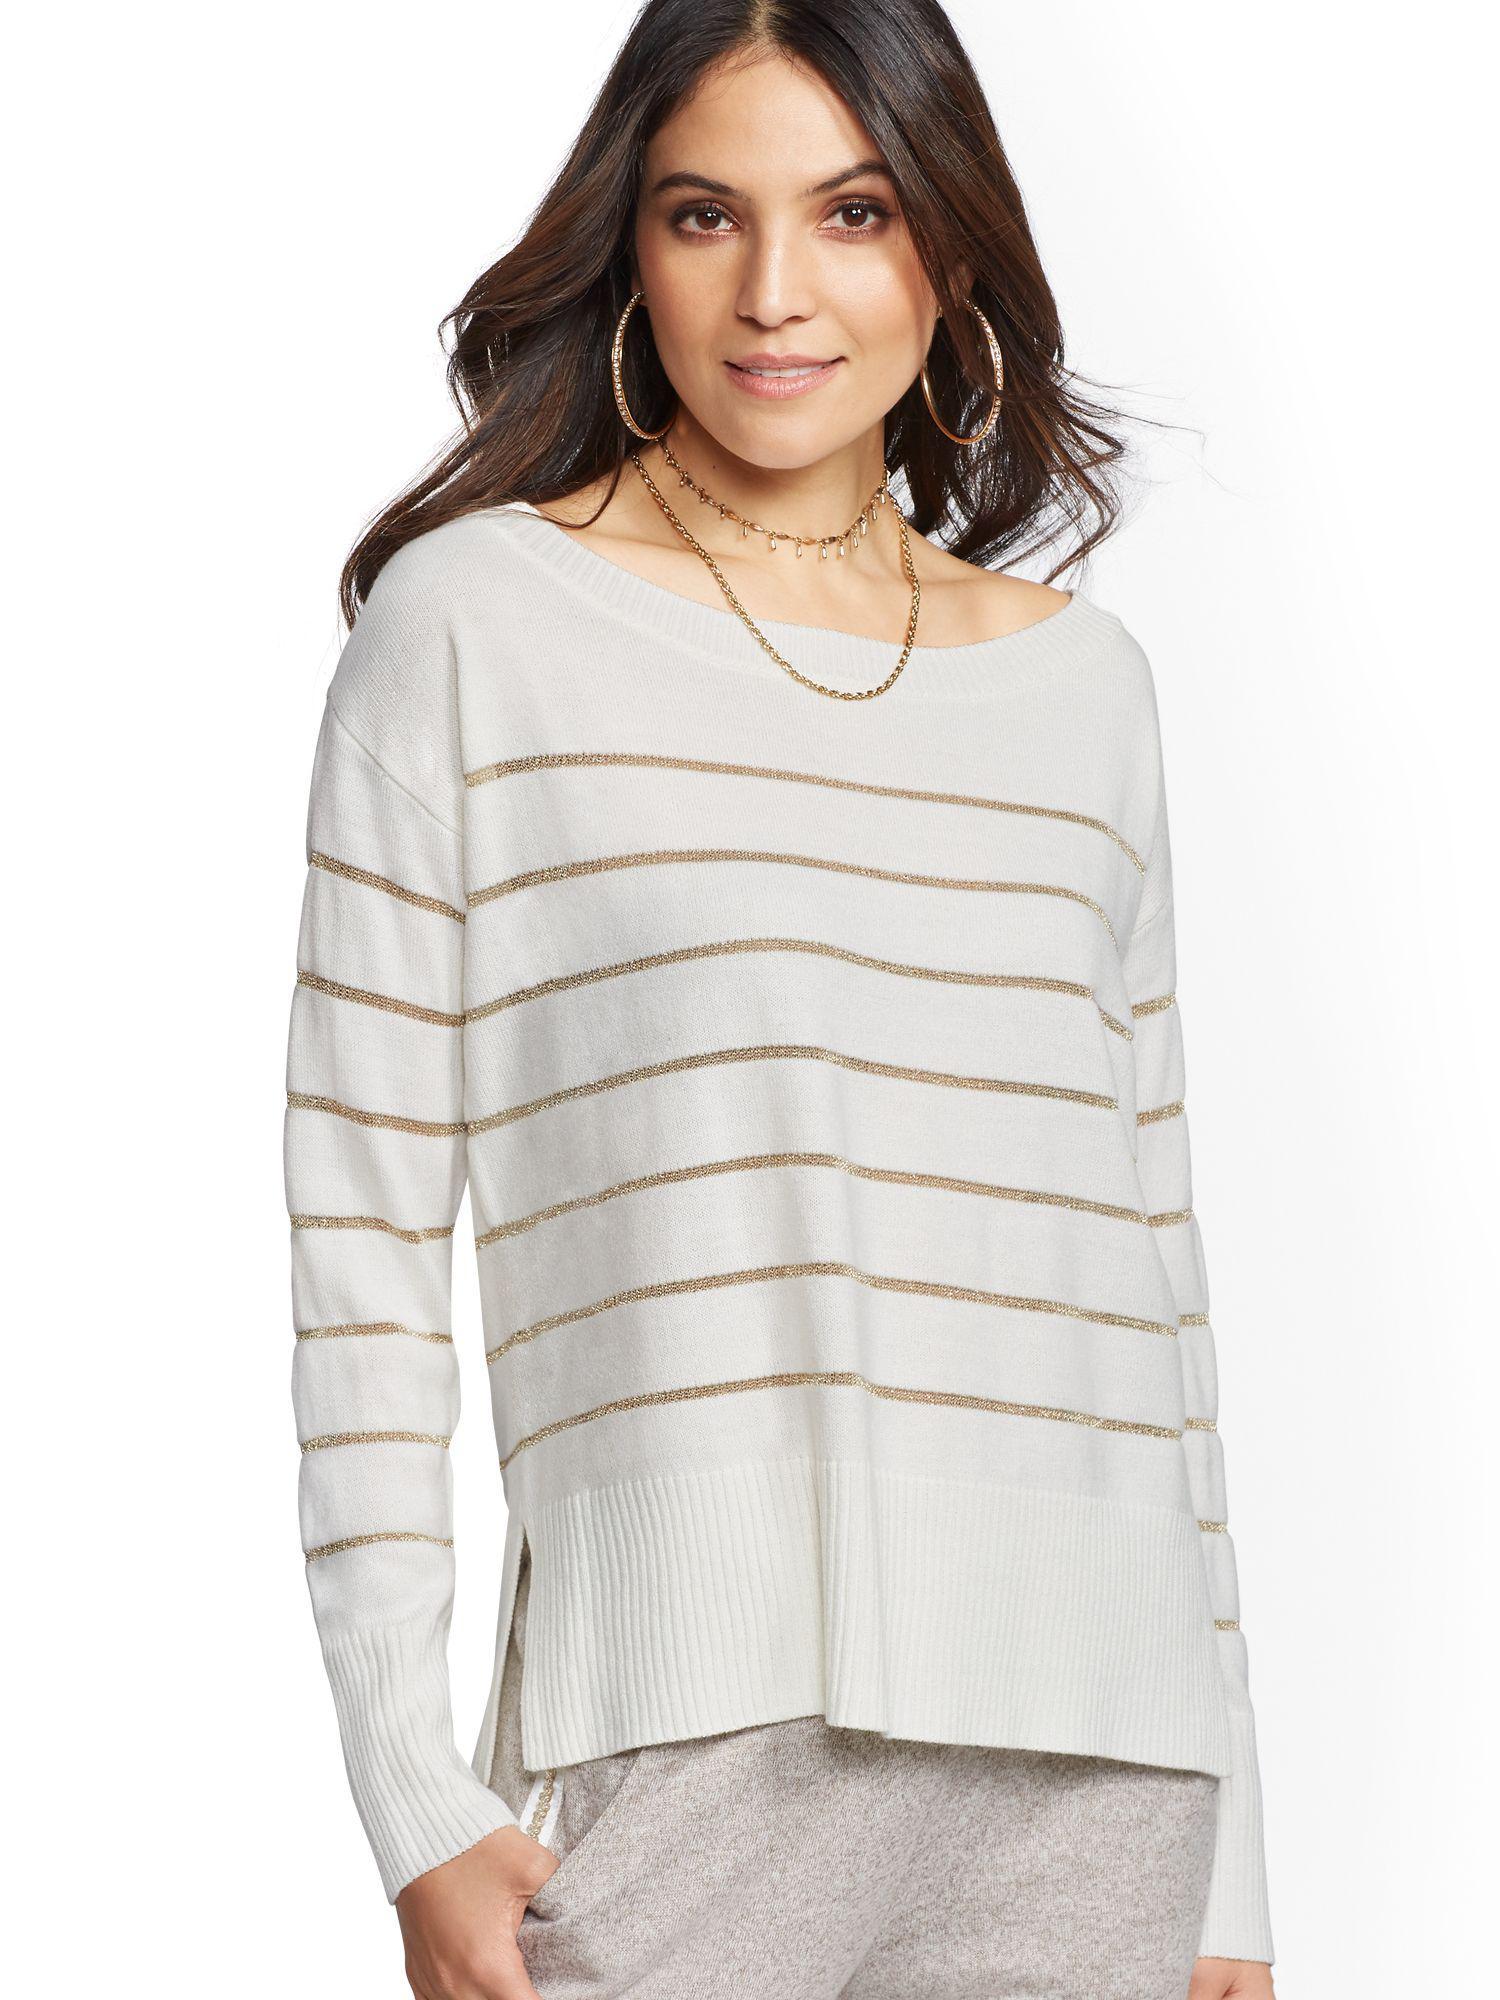 save off d7b16 79093 new-york-company-WINTER-WHITE -W-LUREX-Metallic-stripe-Off-the-shoulder-Sweater.jpeg